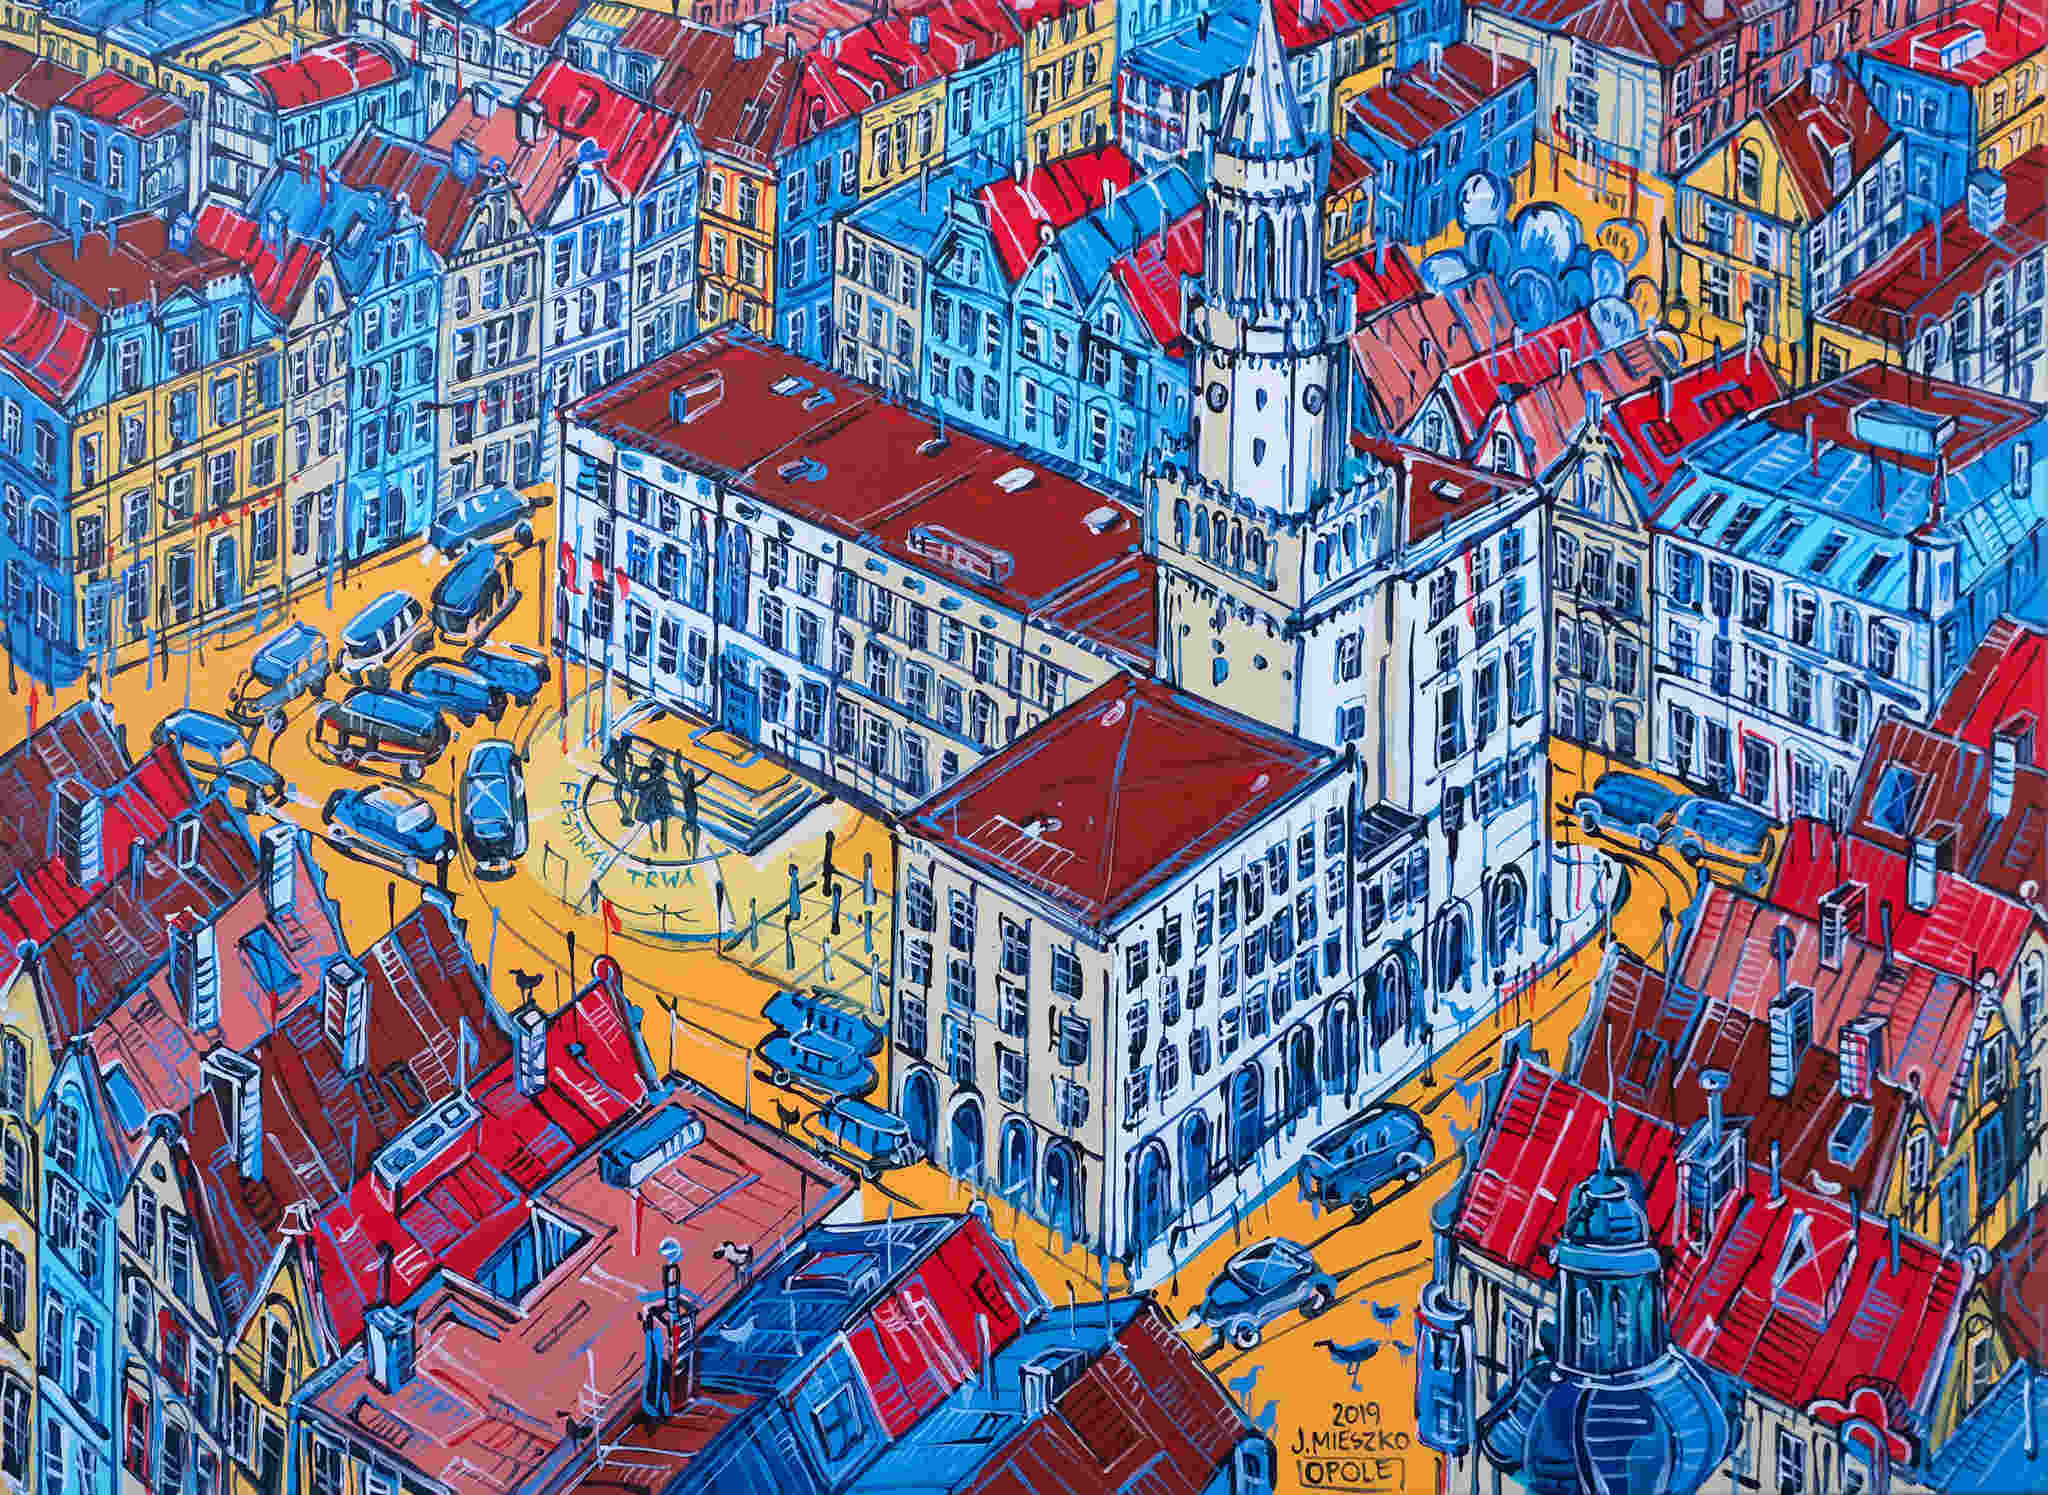 Opole, 2019